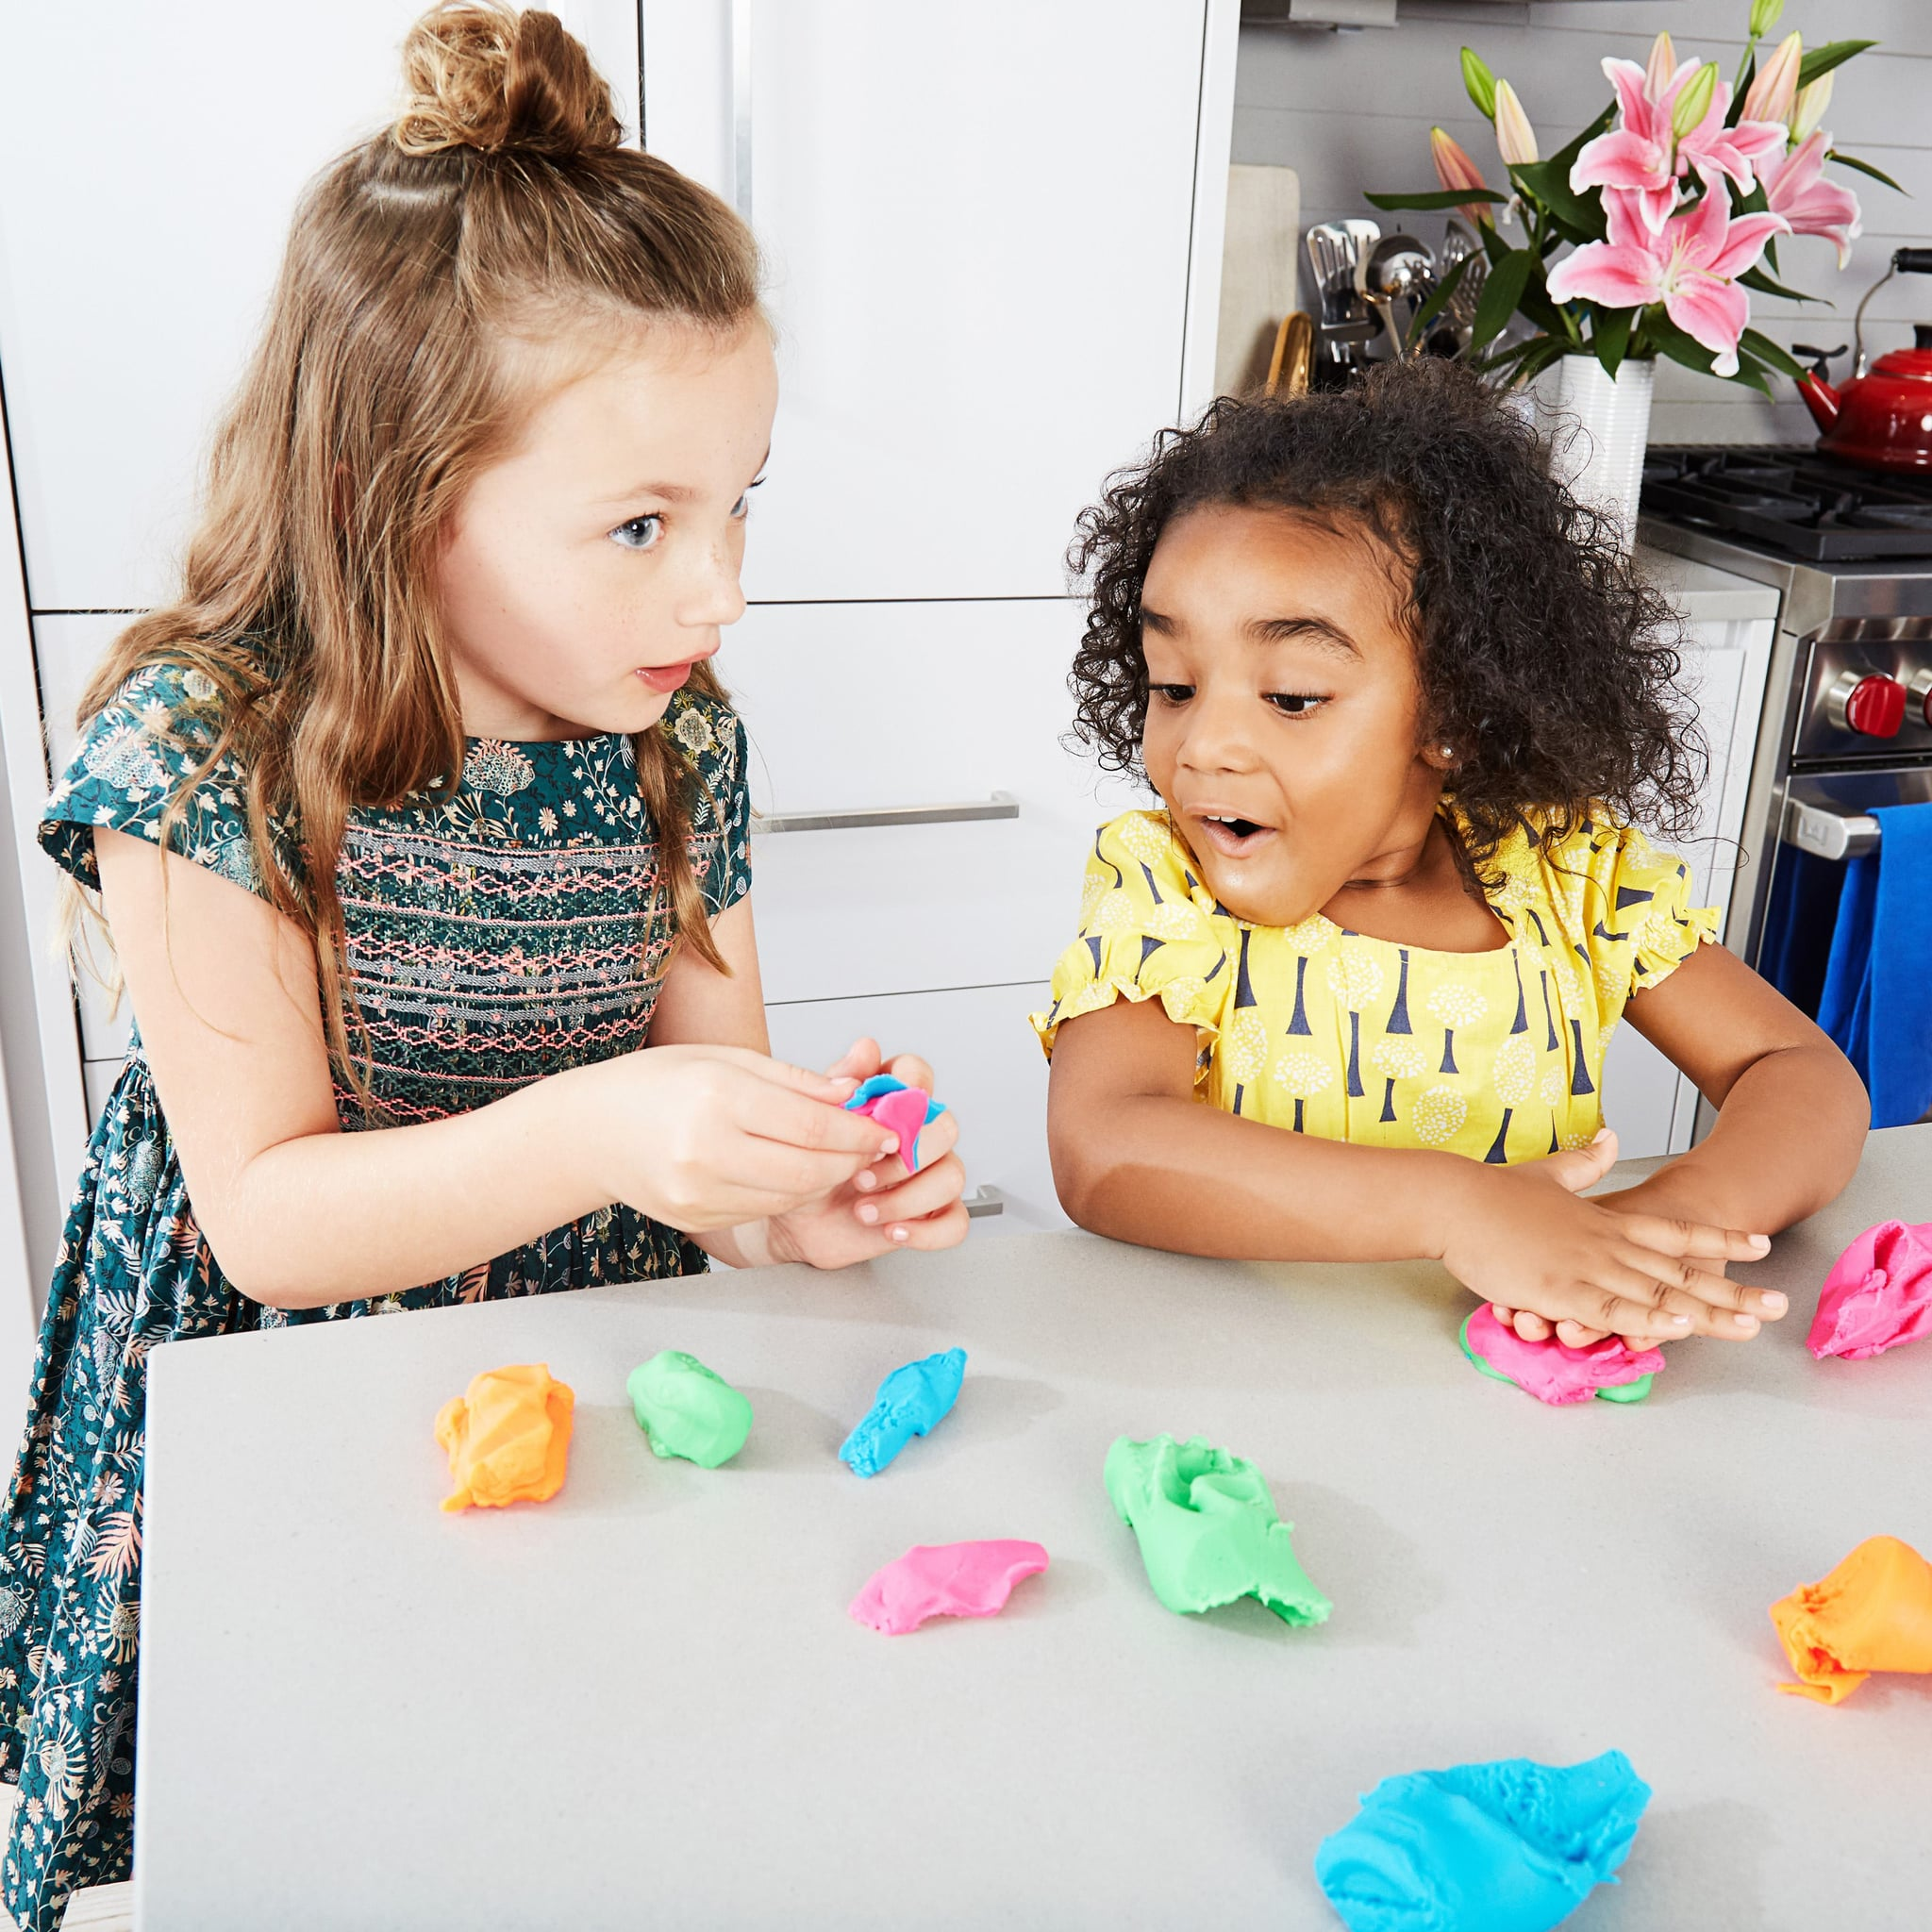 homemade birthday party favors for kids | popsugar moms